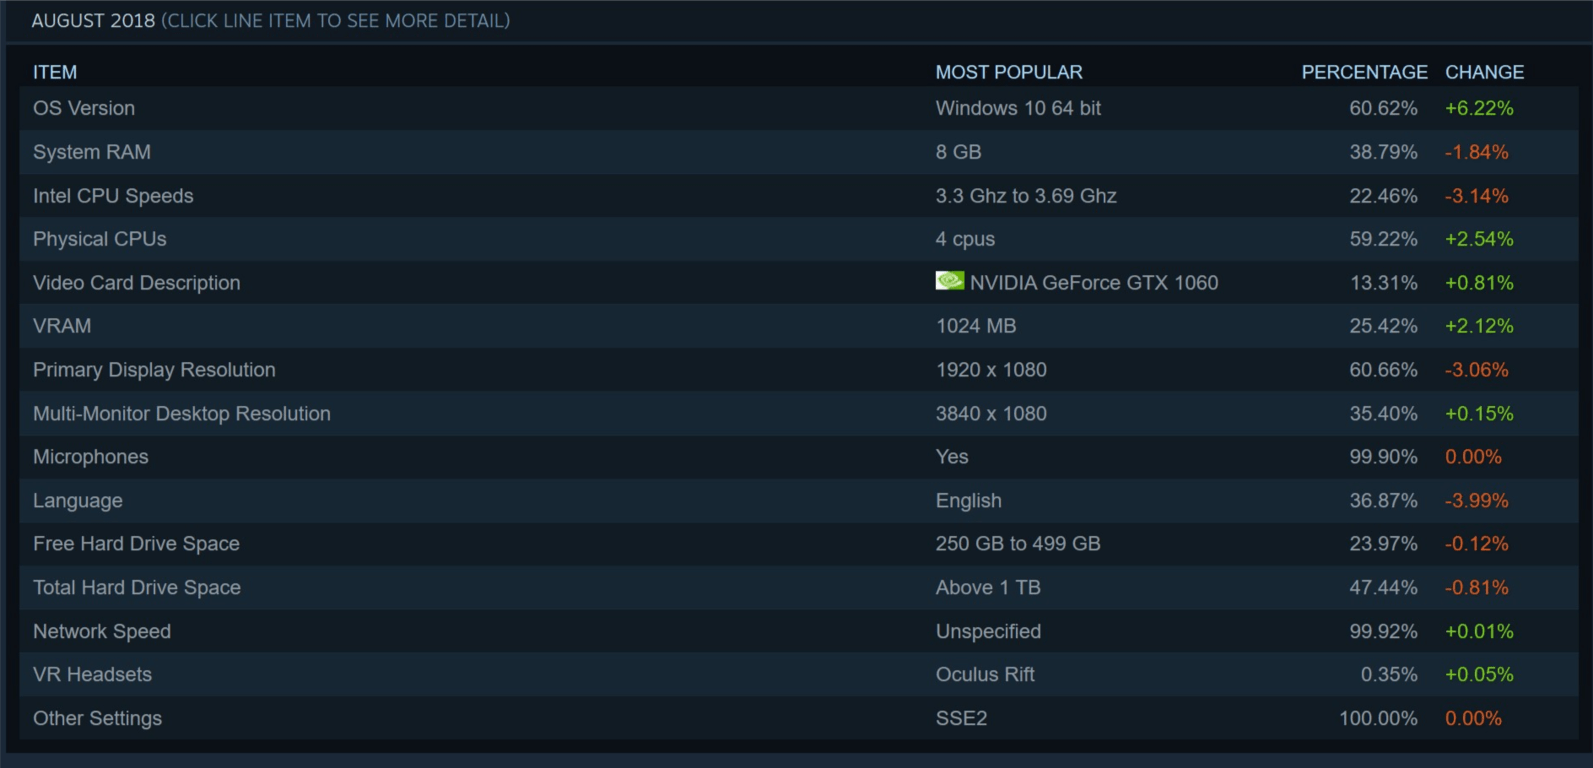 Microsoft, windows 10, steam, video games